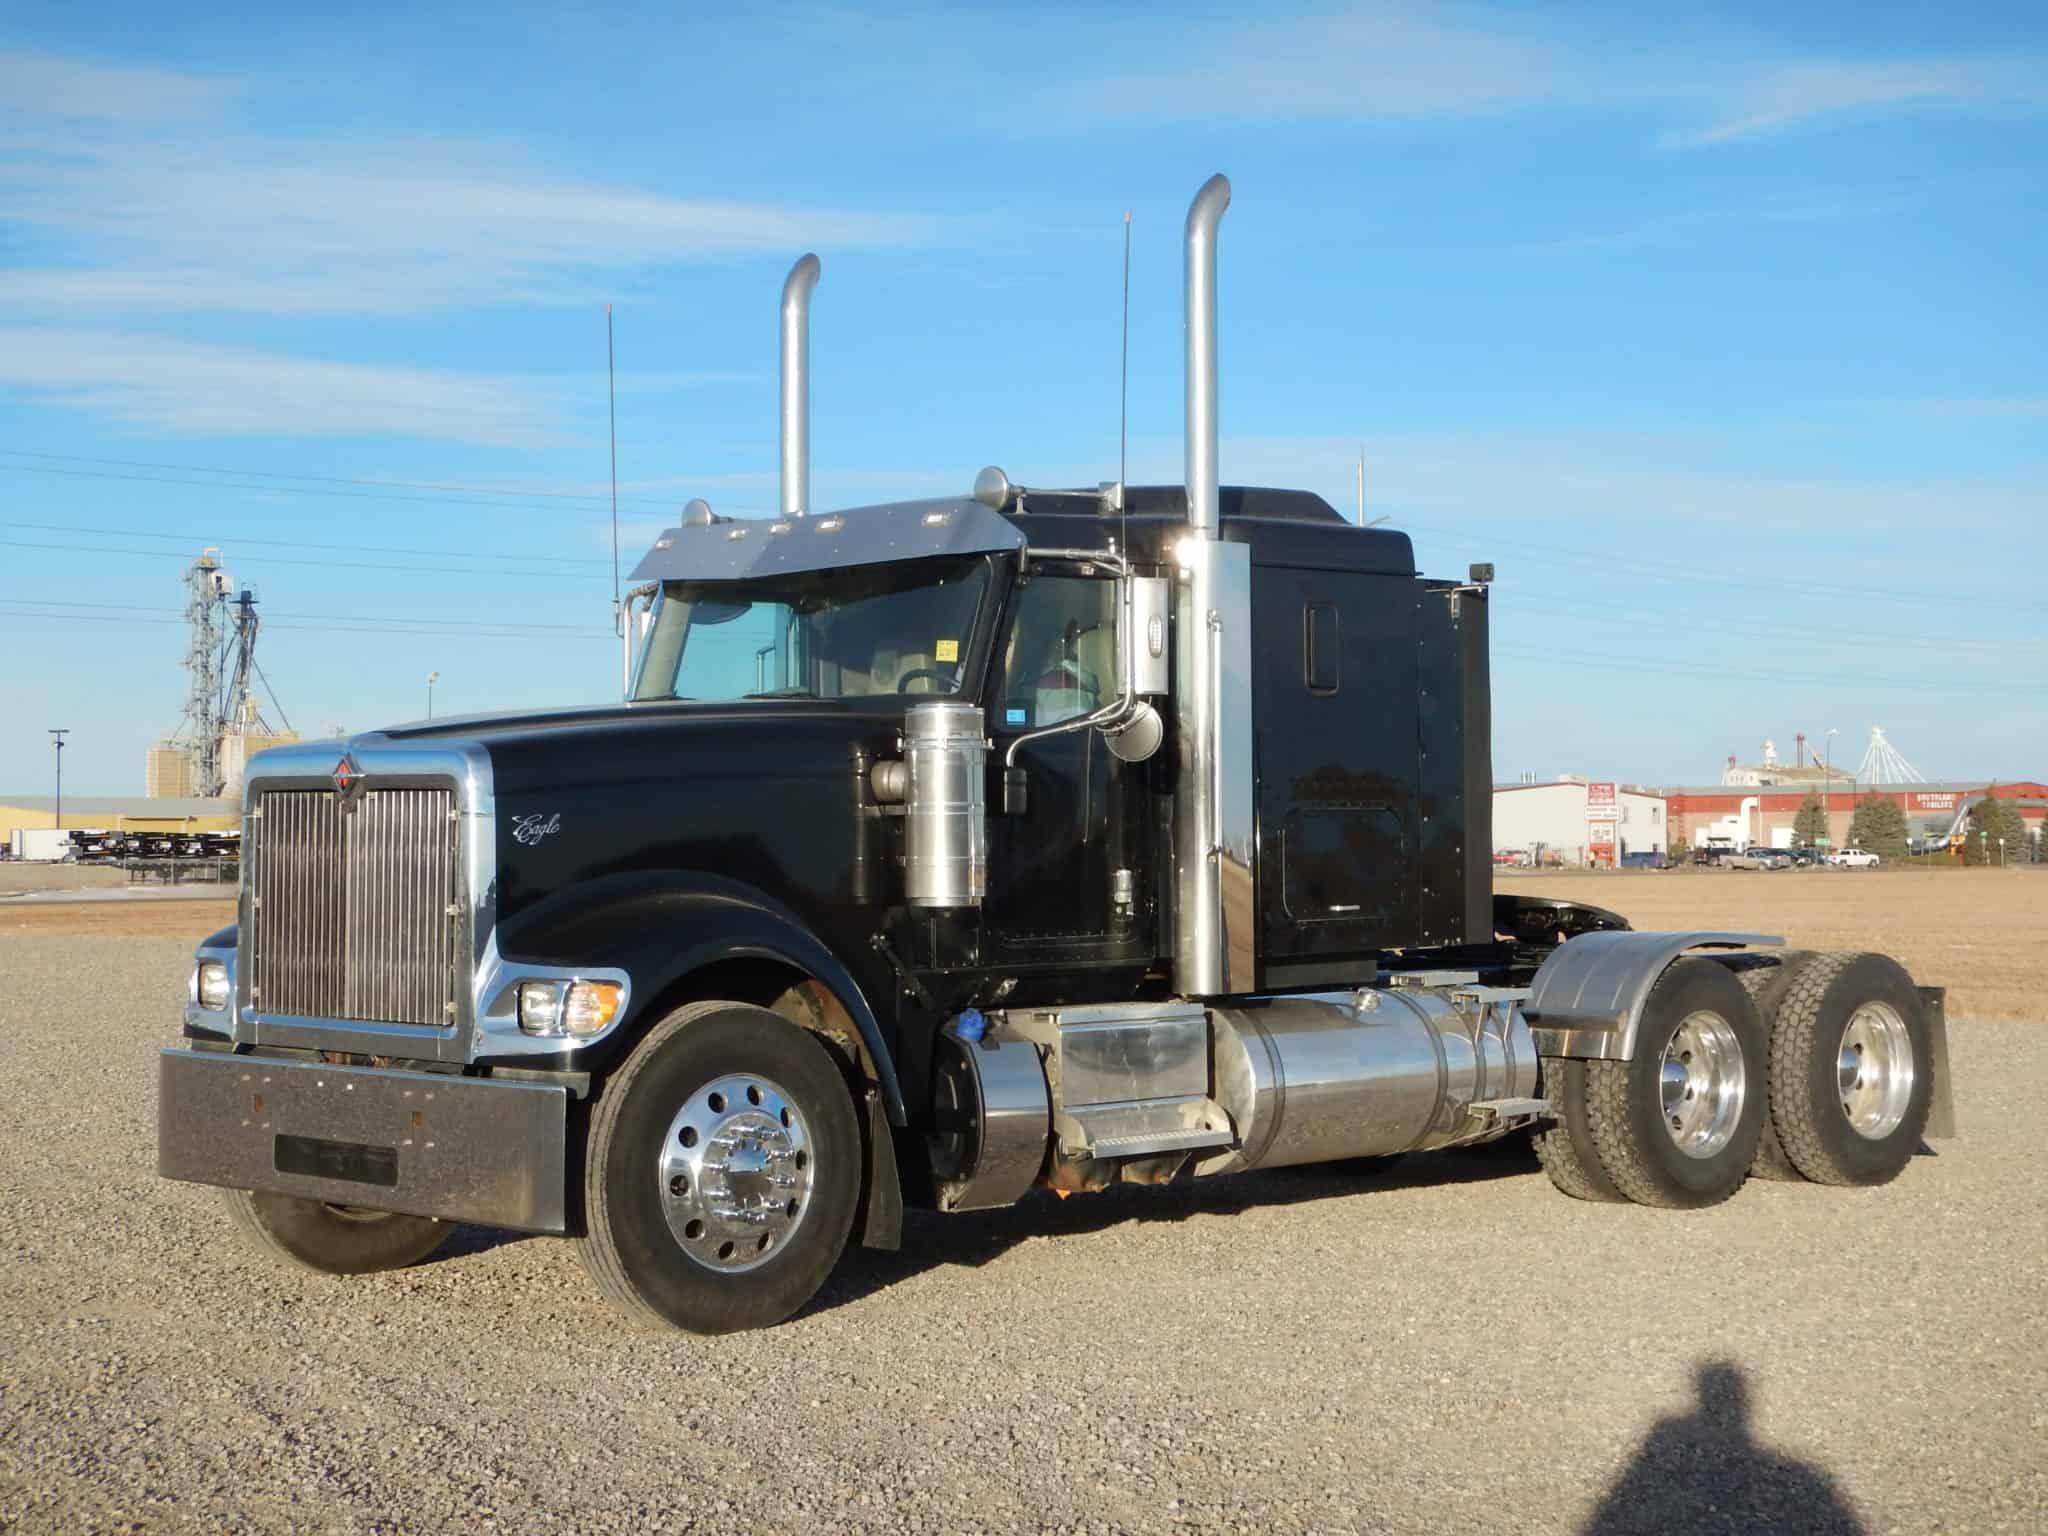 Pickup Trucks For Sales: International Used Truck Sales